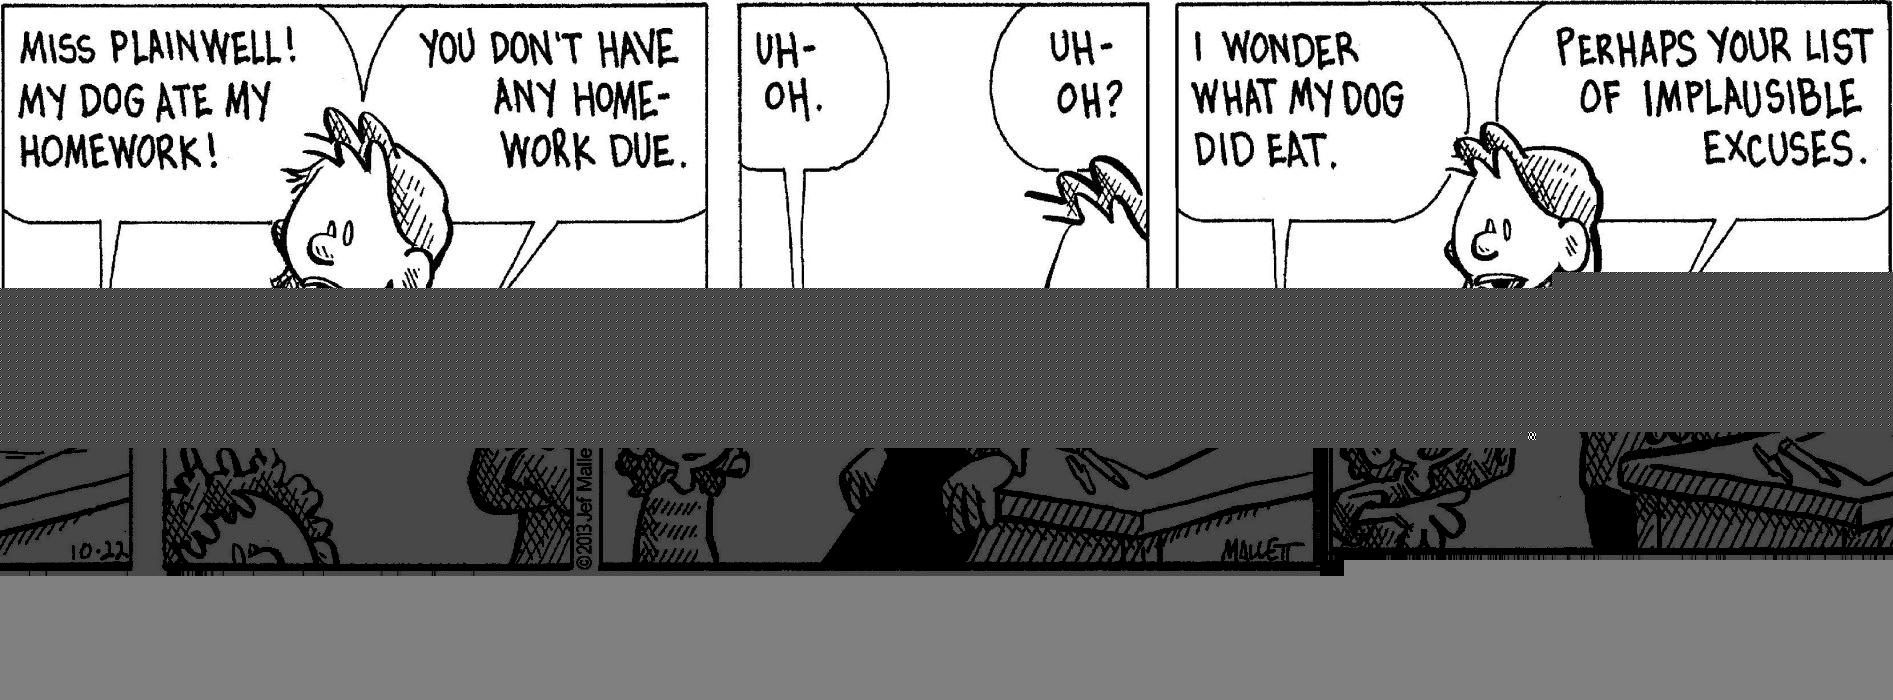 FRAZZ comicstrip humor funny comic (20) wallpaper